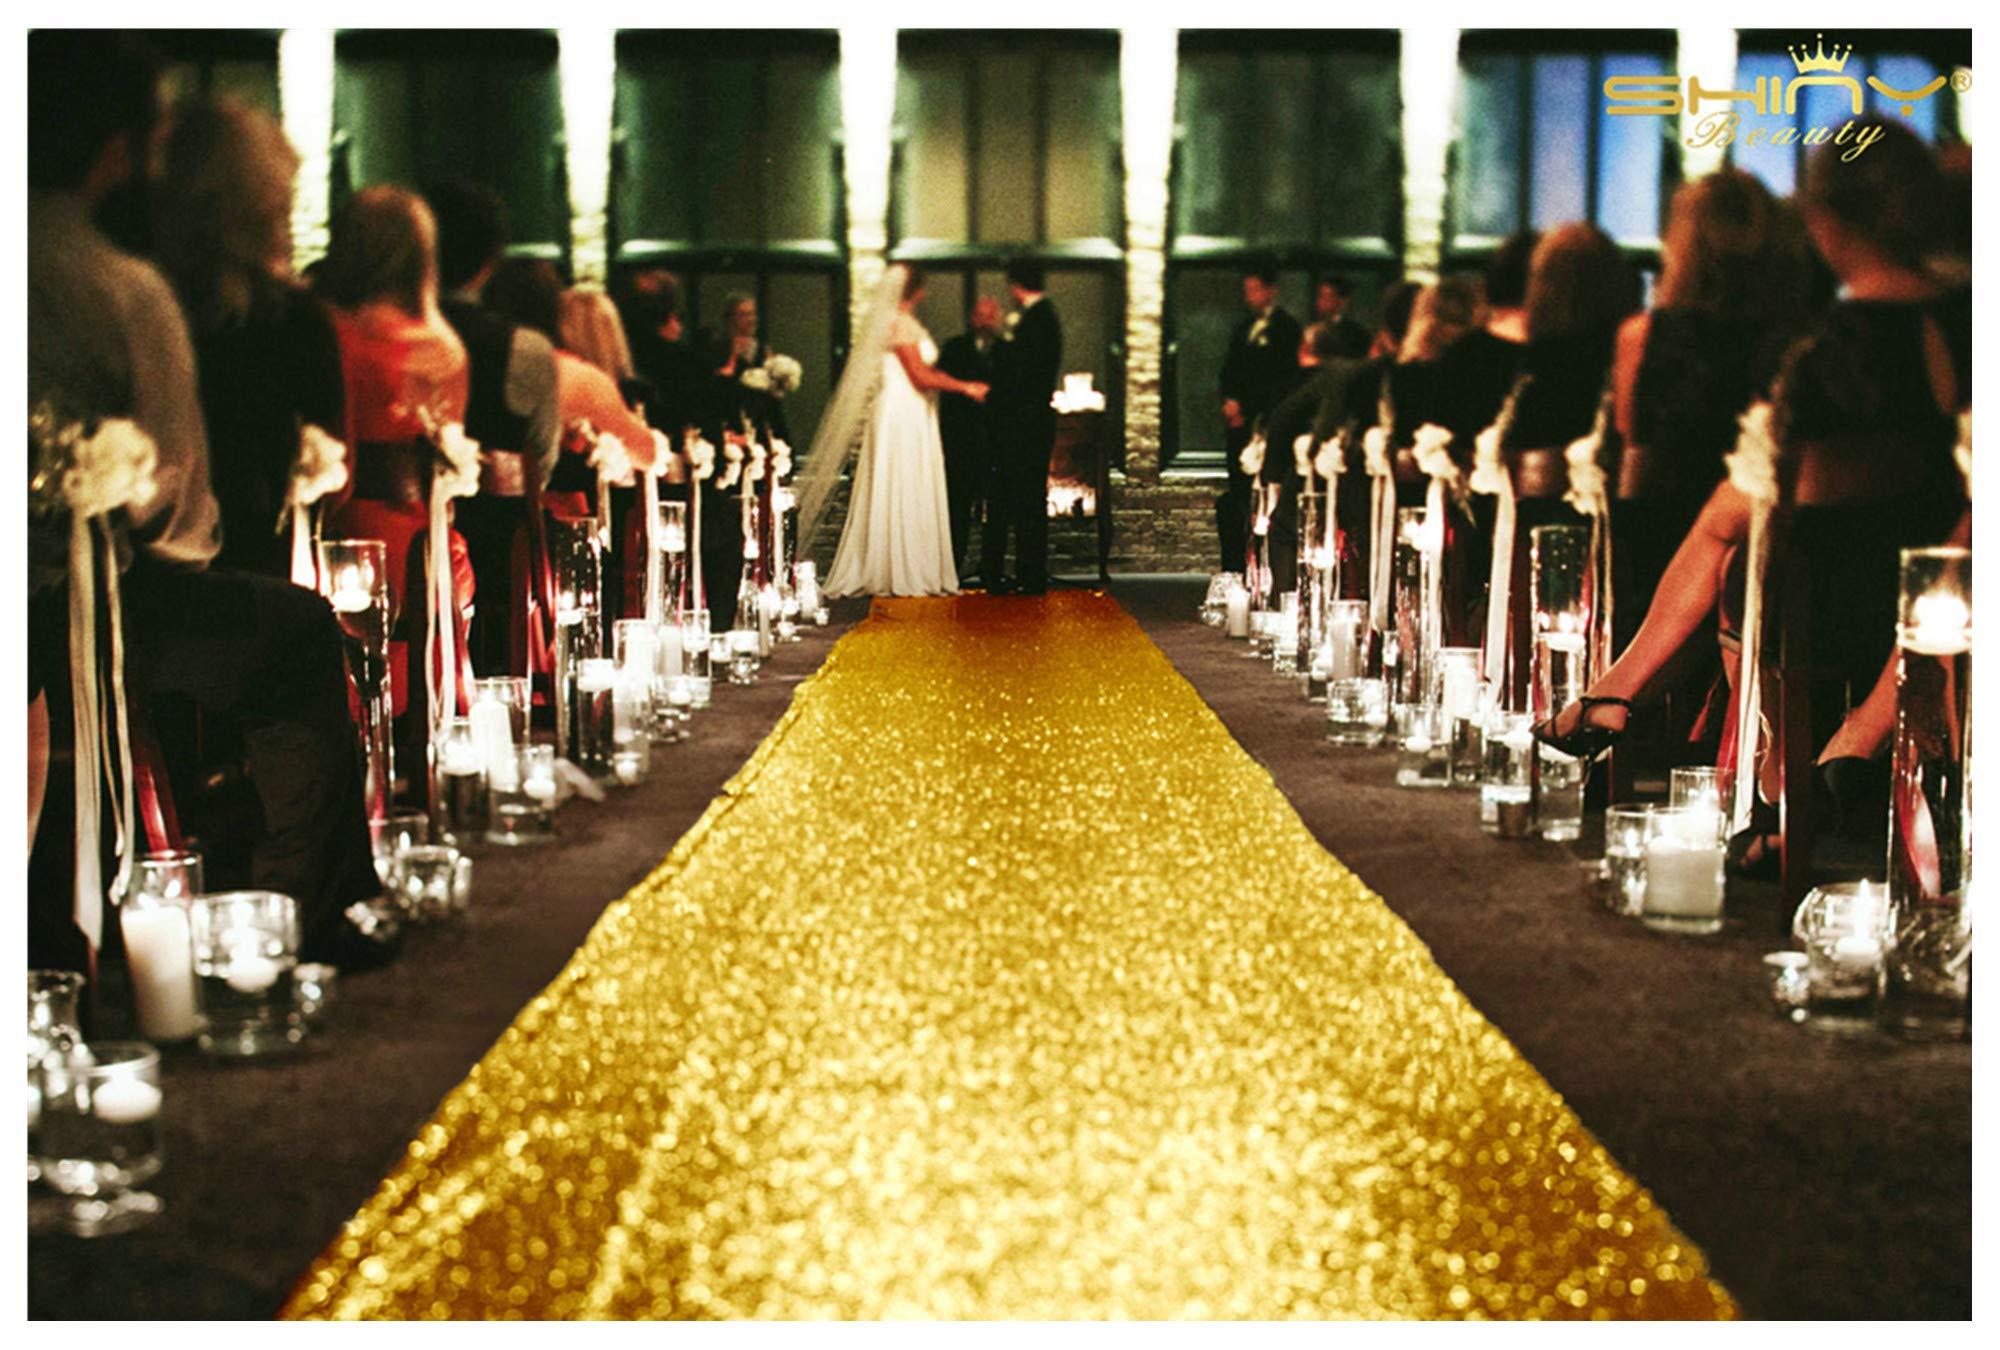 ShinyBeauty Isle Runner Gold Wedding Aisle Runners 40 Feet Beach Wedding Decorations ~N10.11